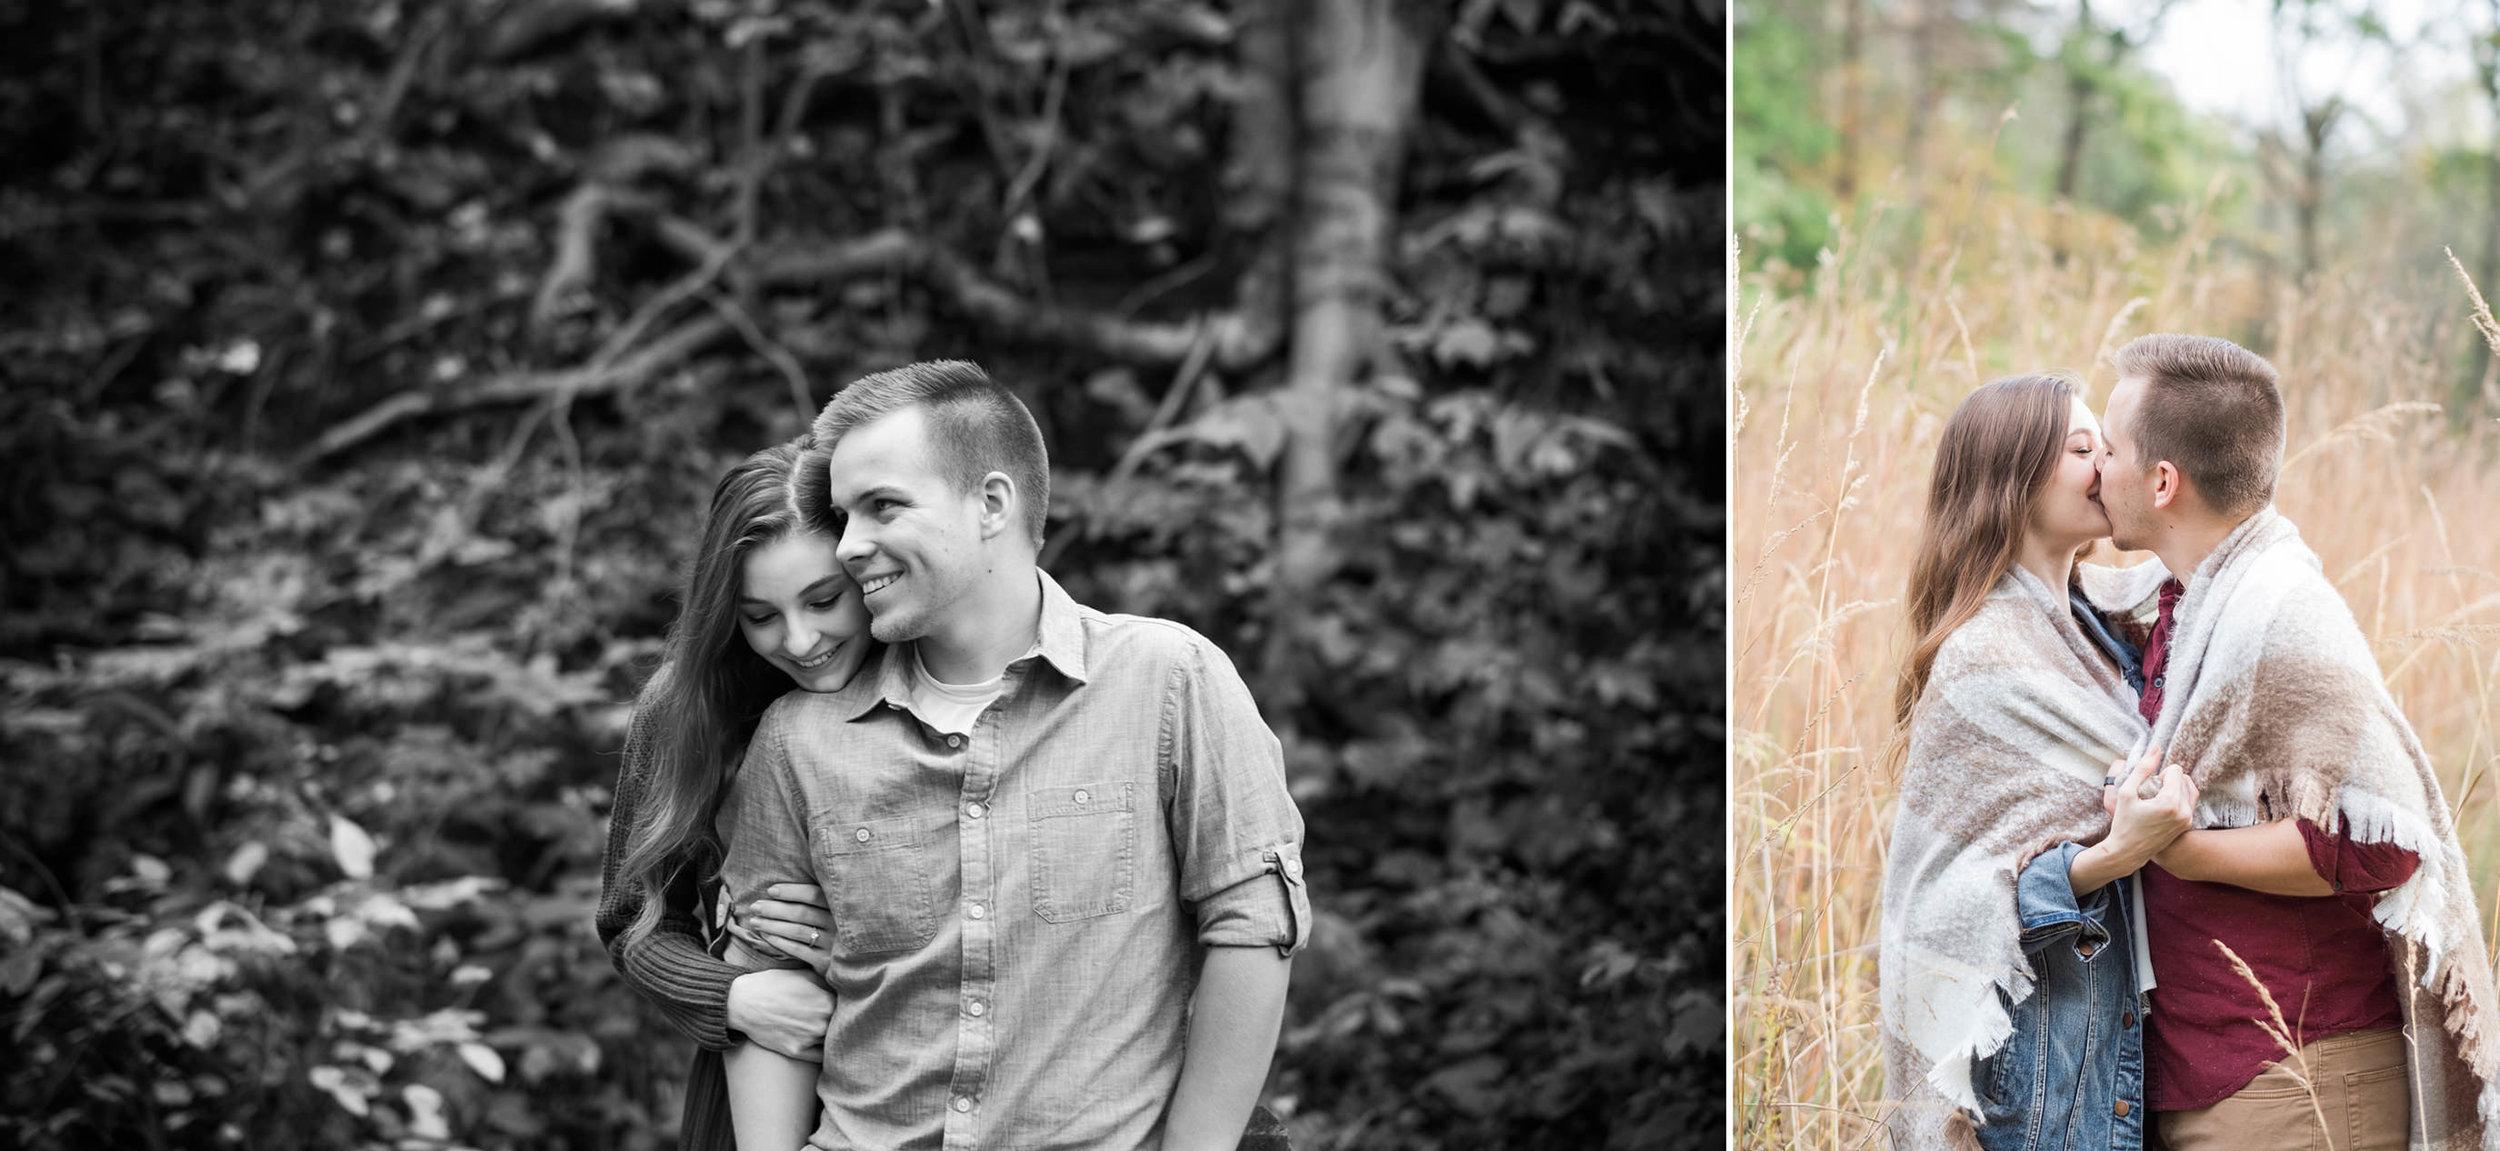 Emily&Daniel_Engagement_BlogComposit_0003.jpg